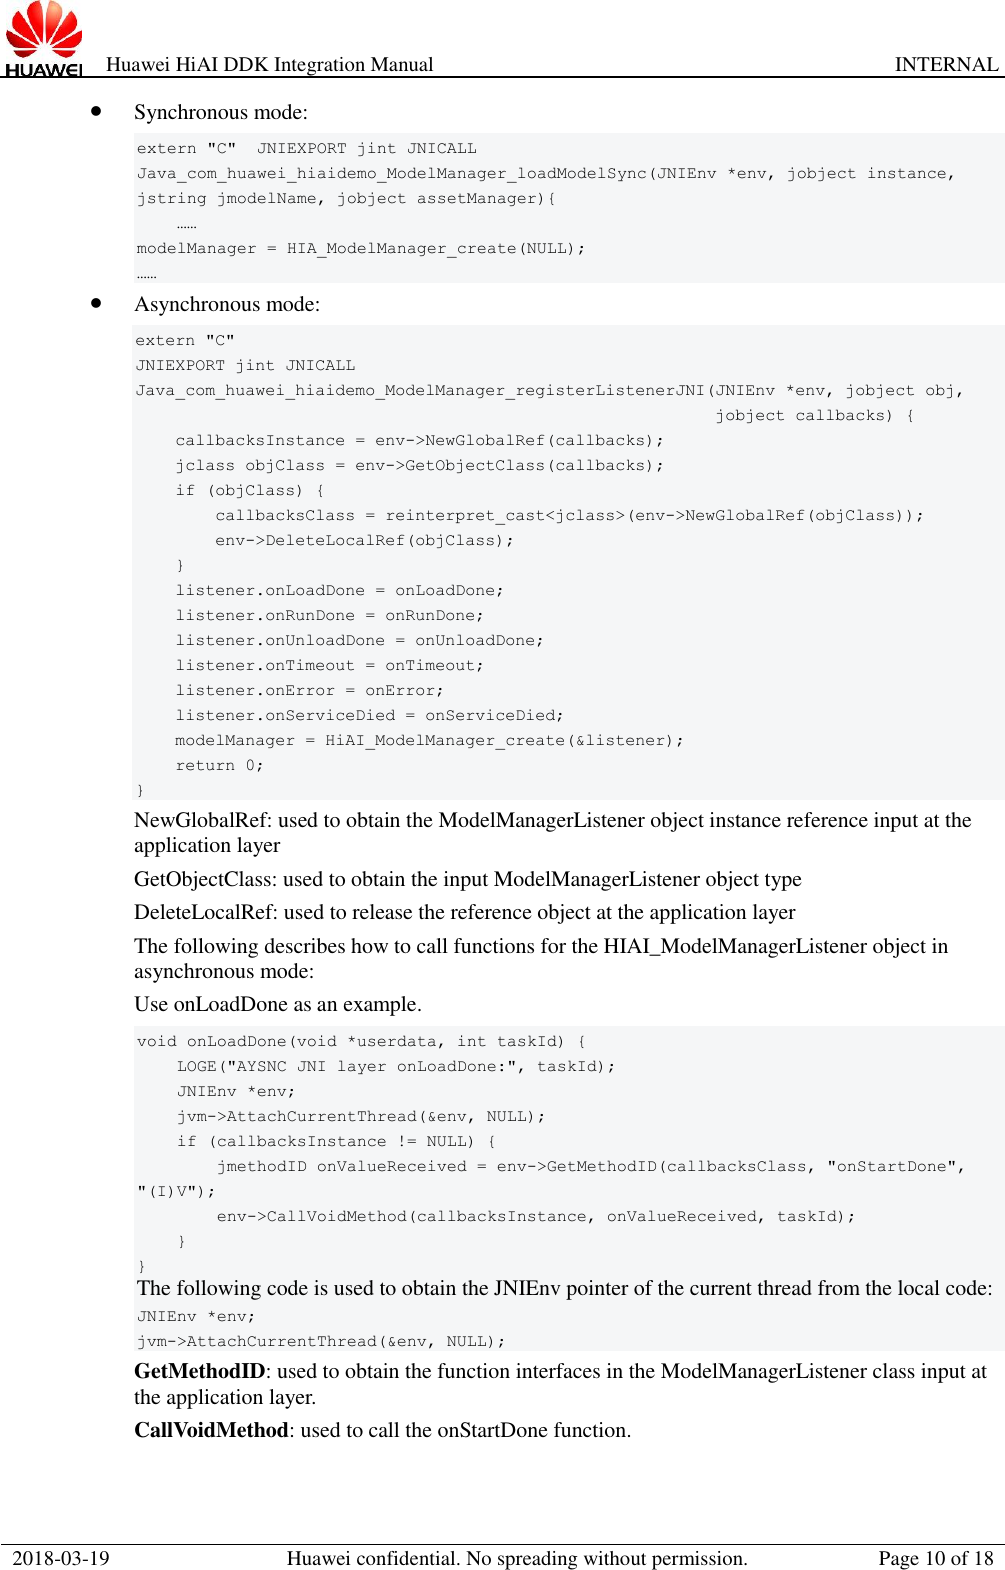 Huawei Hi AI DDK Integration Manual